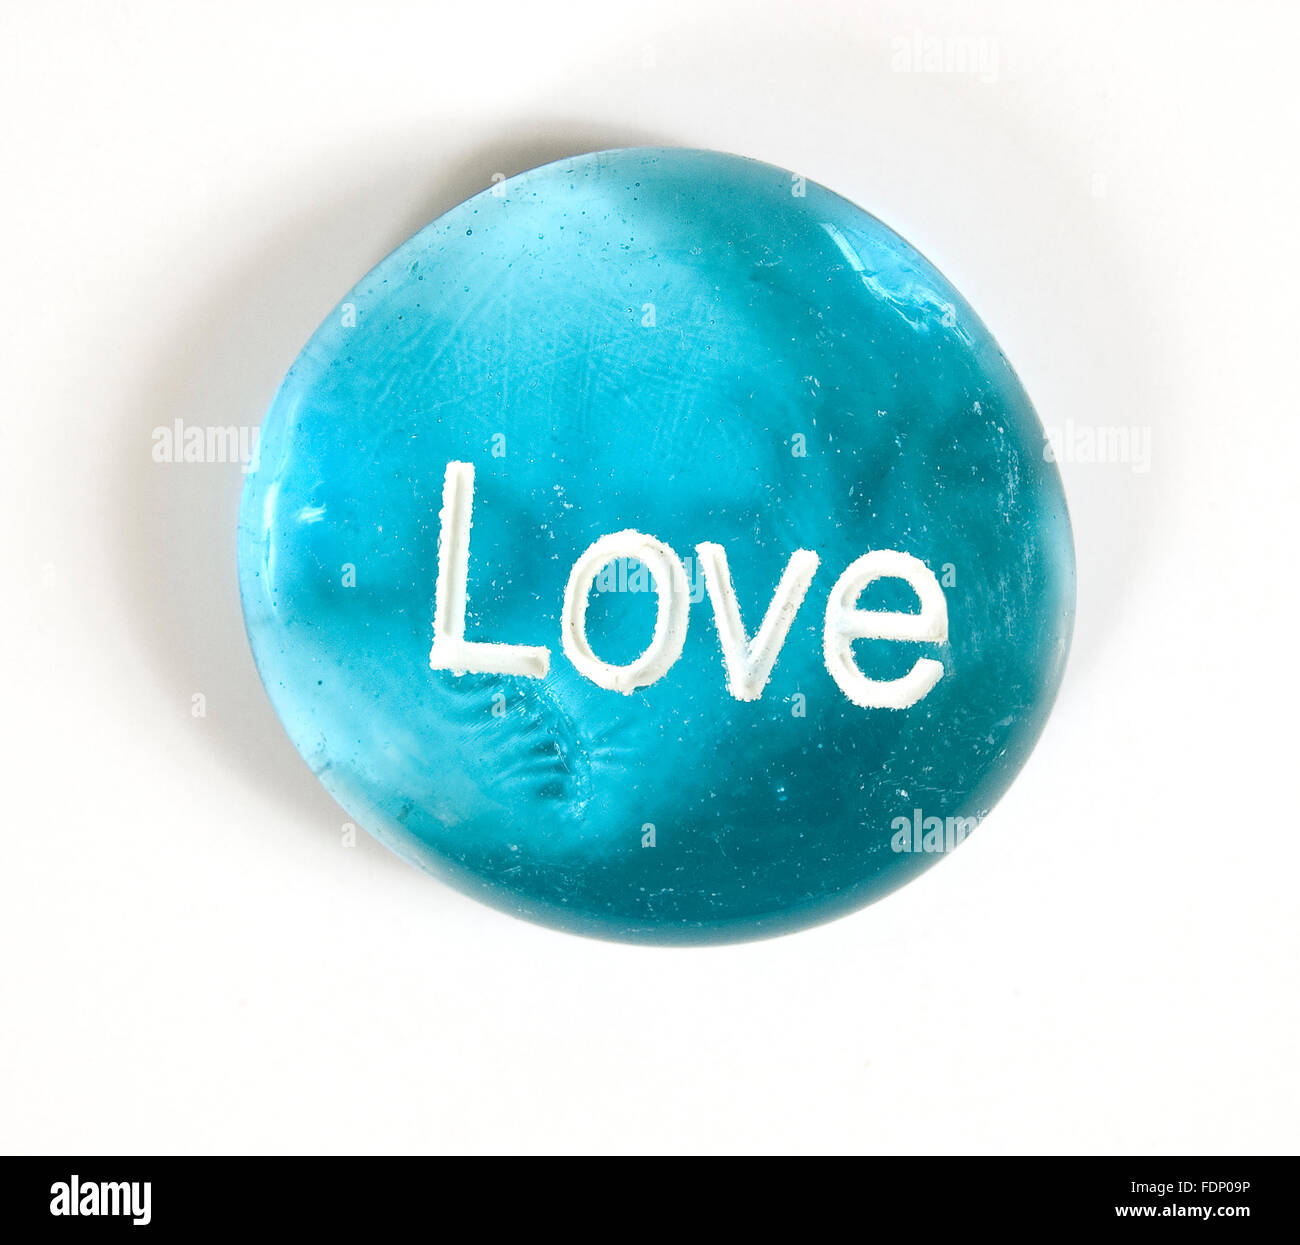 Love Stone on White - Stock Image